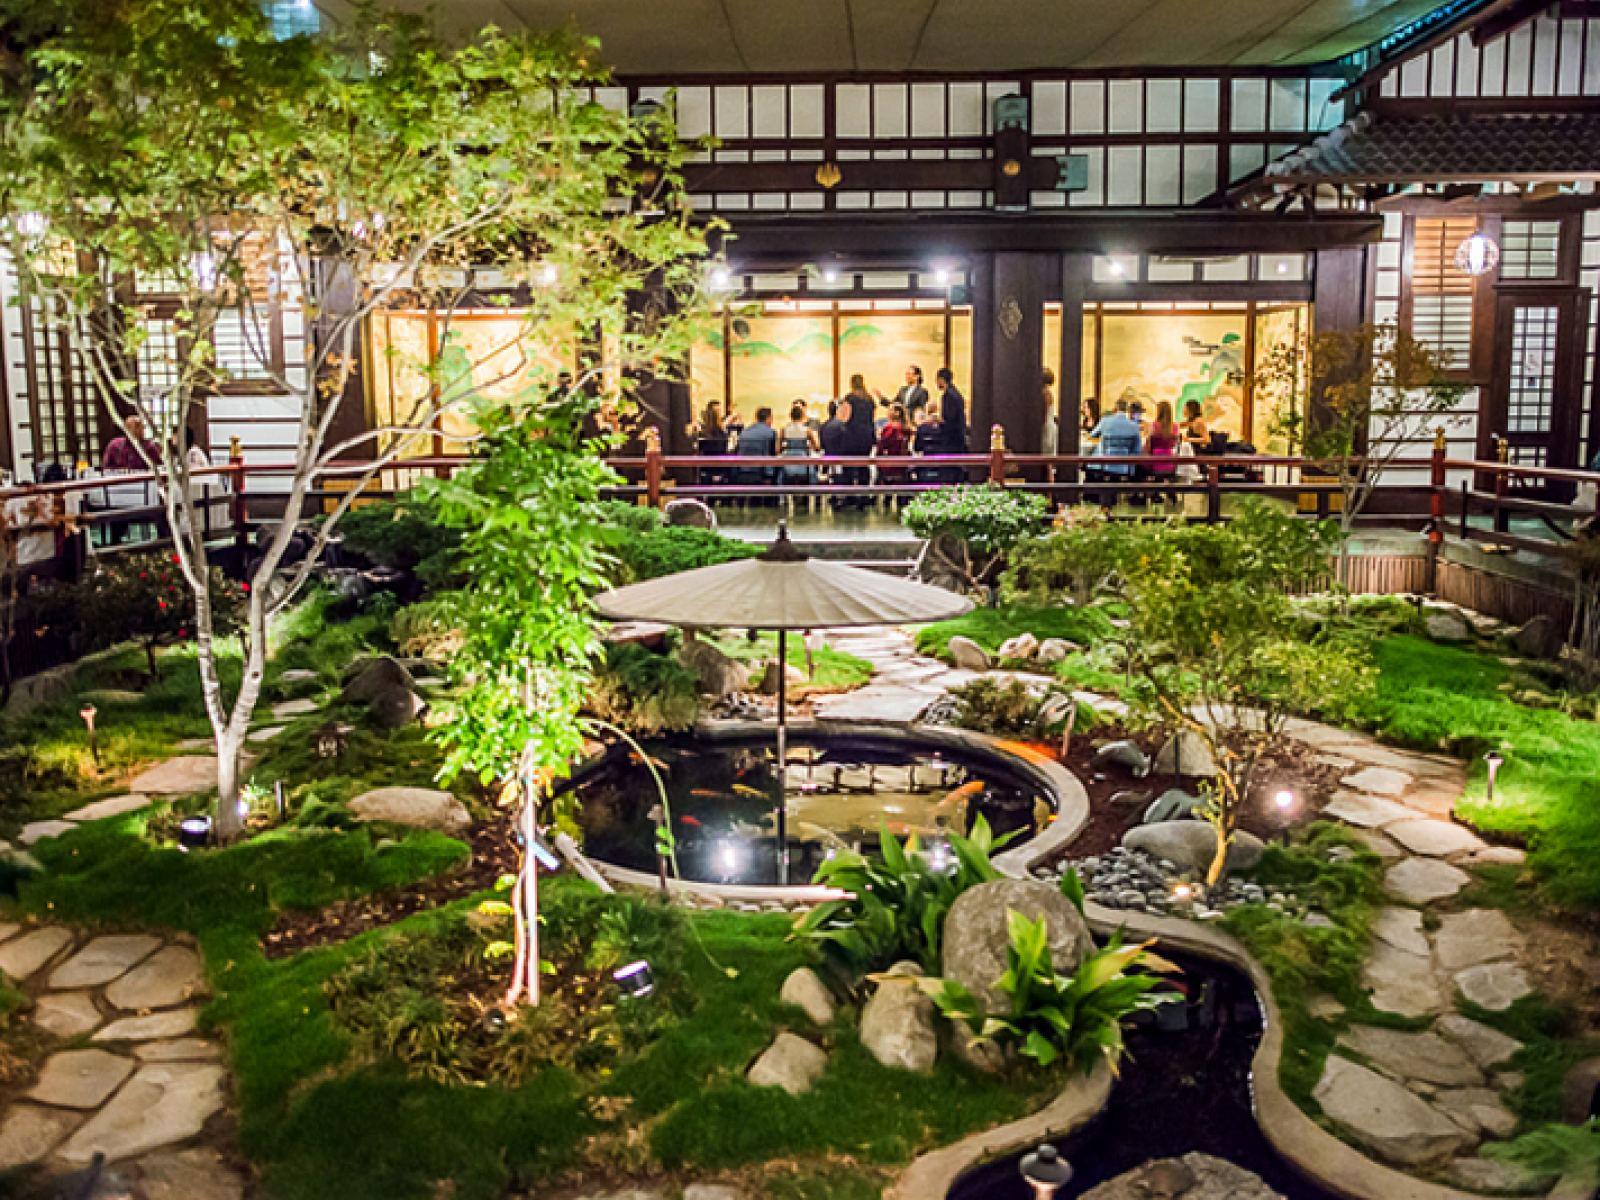 The Garden Courtyard | Photo: Yamashiro, Facebook